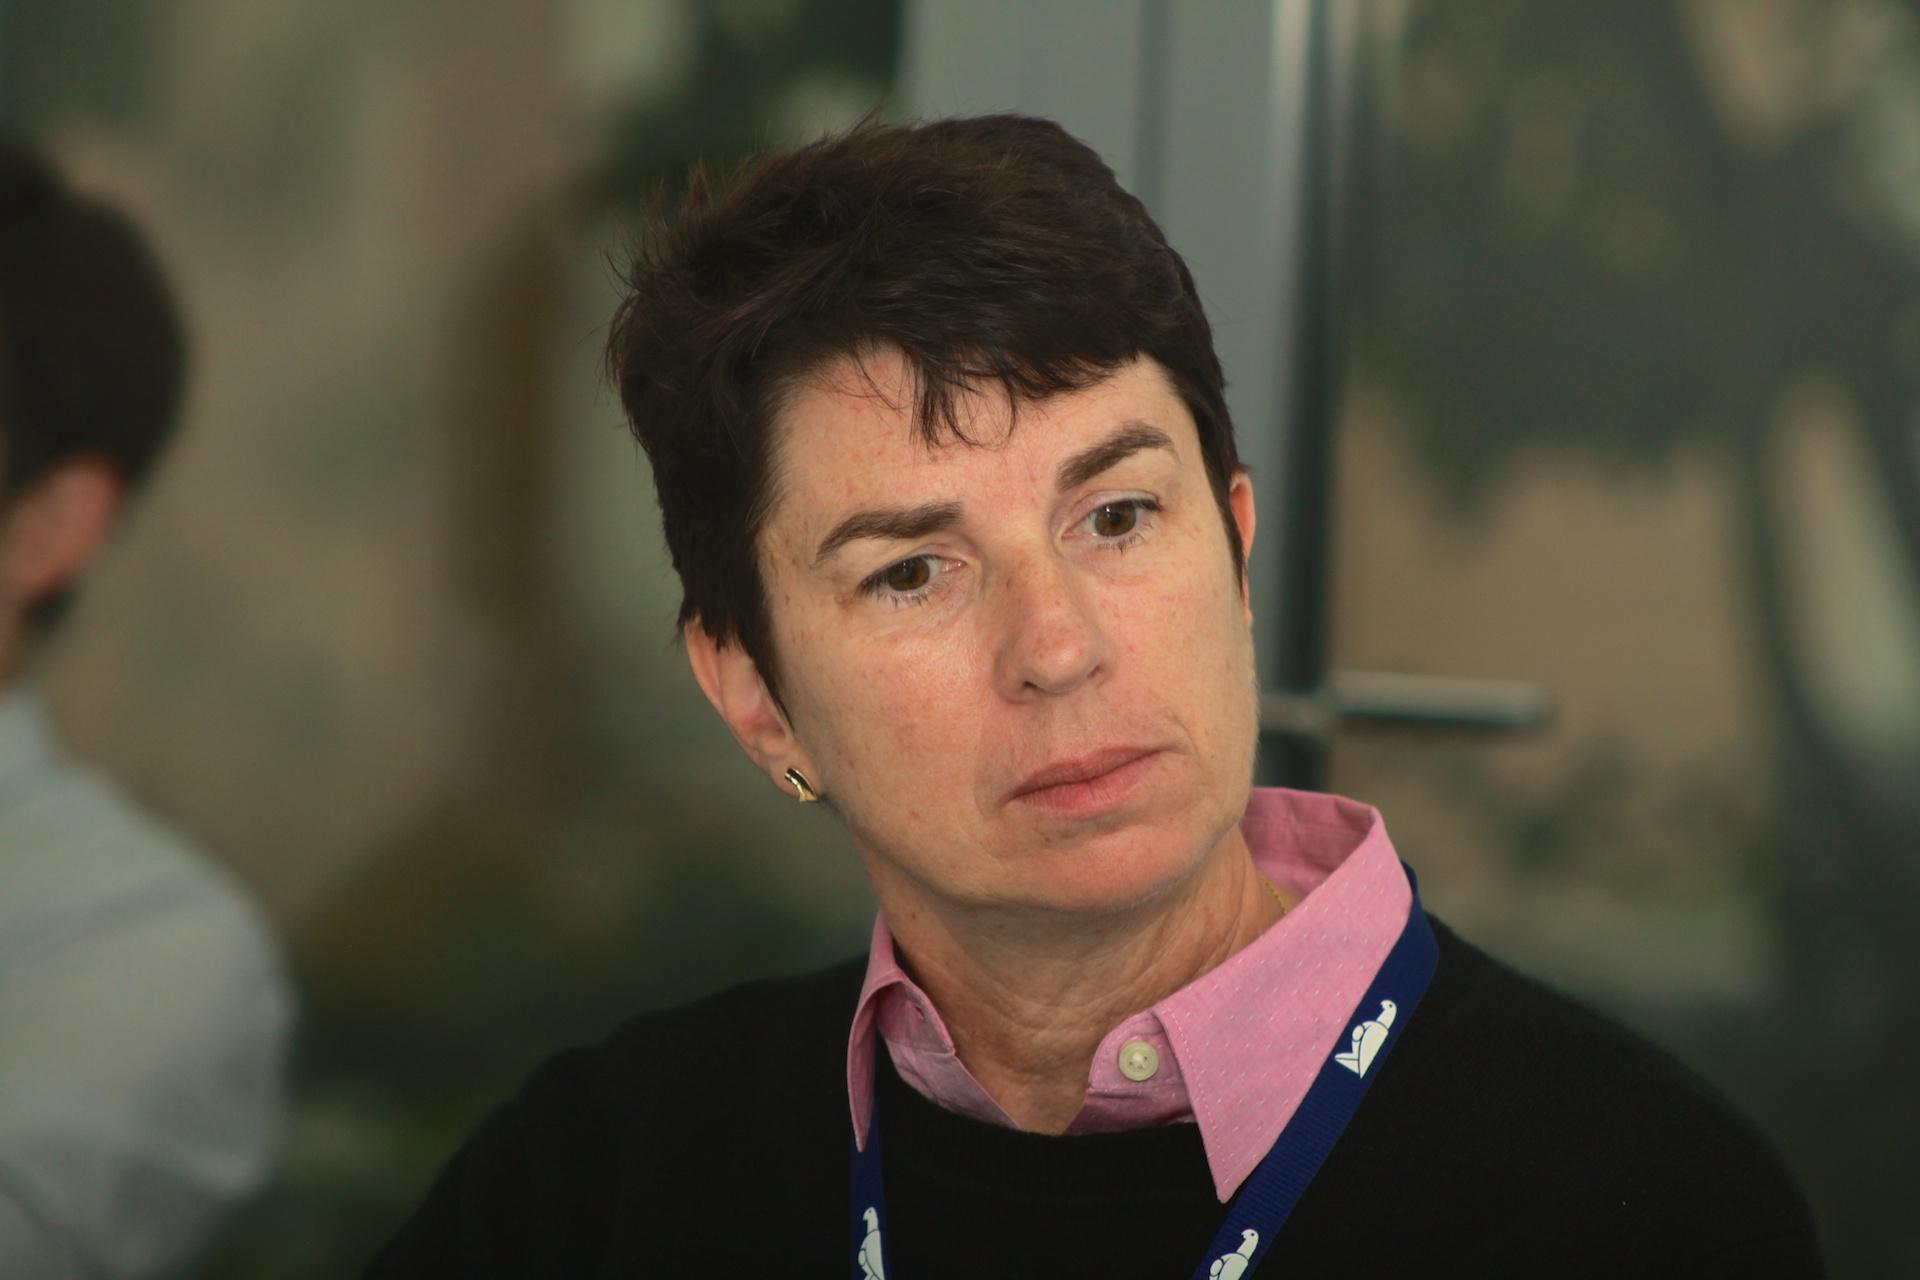 Dr Ramona Doyle. Photographed by Honza Cervenka.